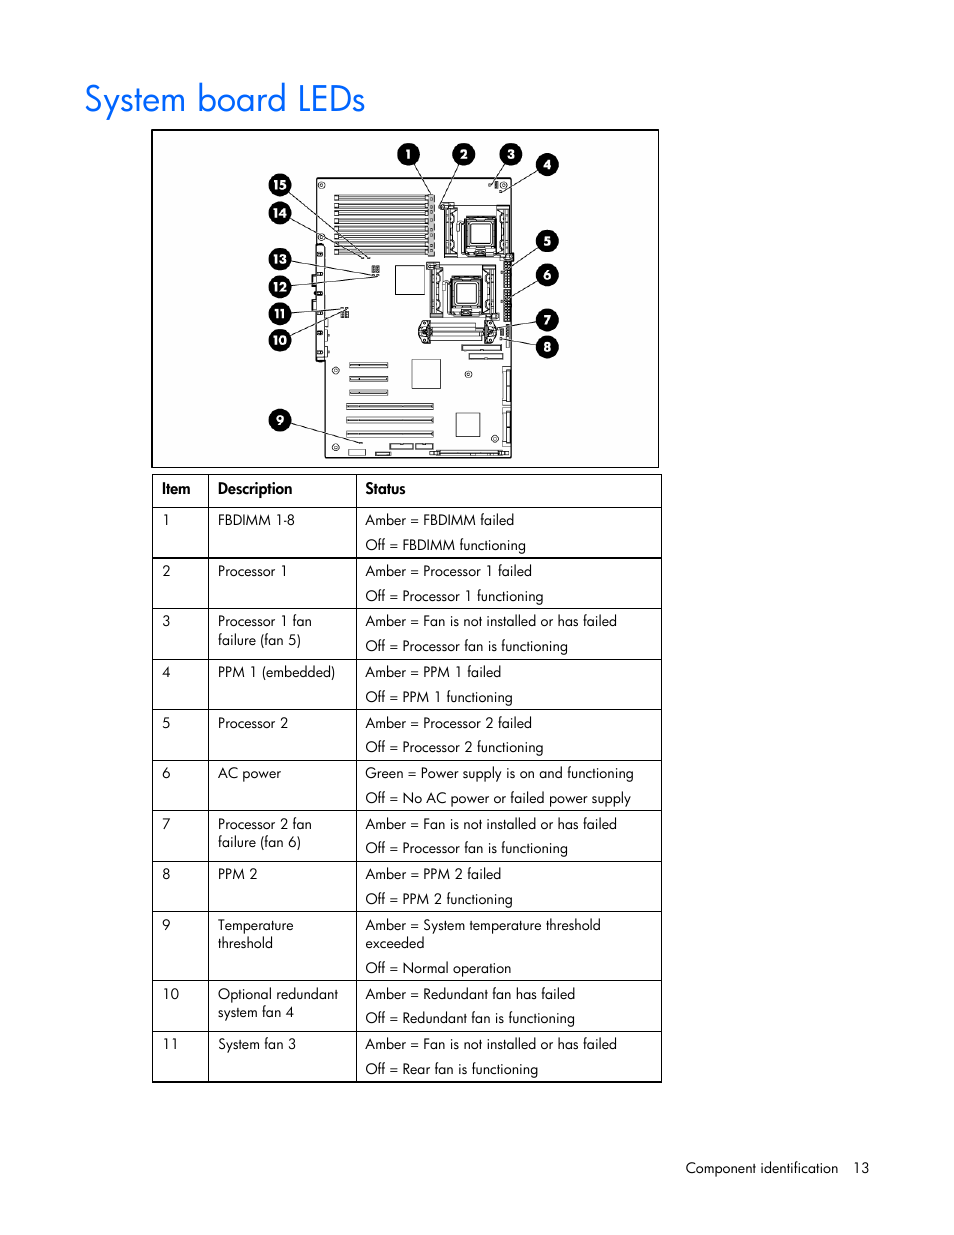 system board leds hp proliant ml350 g5 server user manual page rh manualsdir com hp ml350 g5 motherboard manual hp ml350 gen10 manual